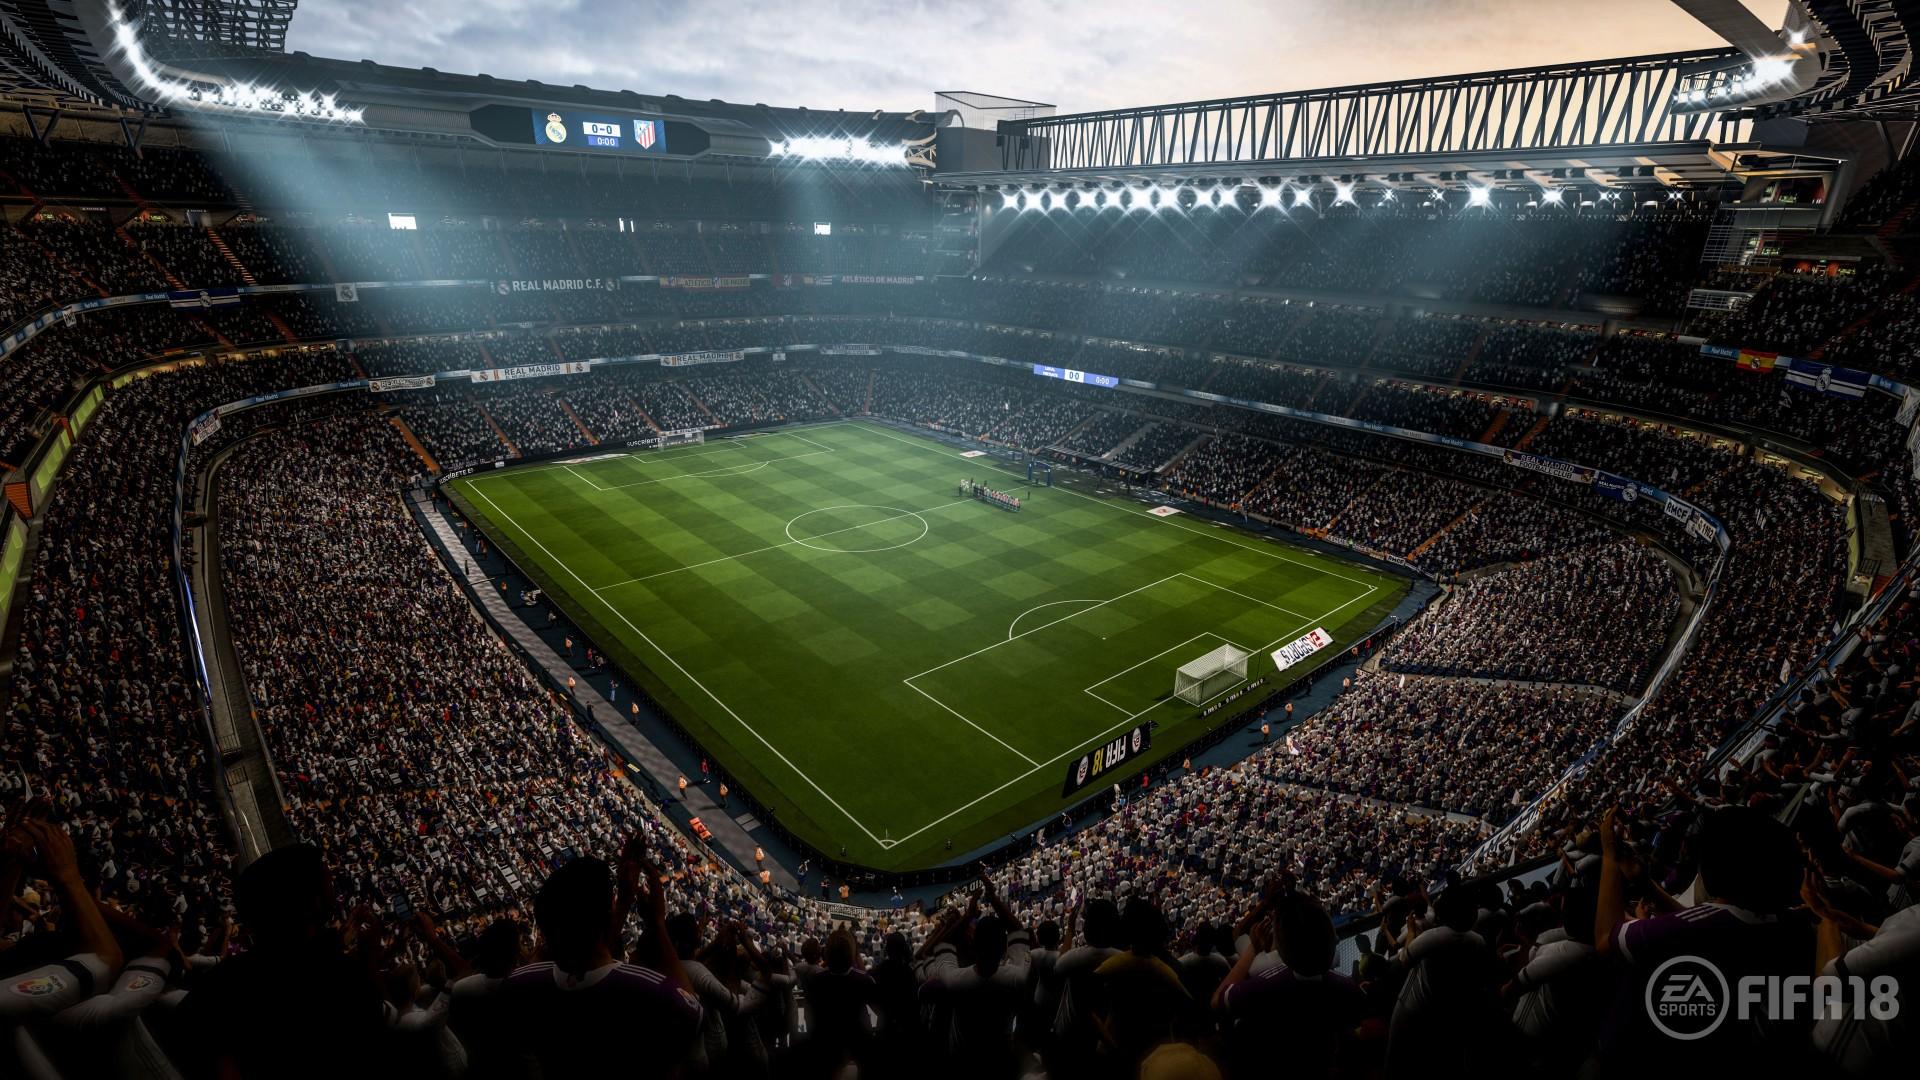 Iphone X Wallpaper Hd Original Fifa 18 Soccer Video Game Stadium 4k 8k Wallpapers Hd